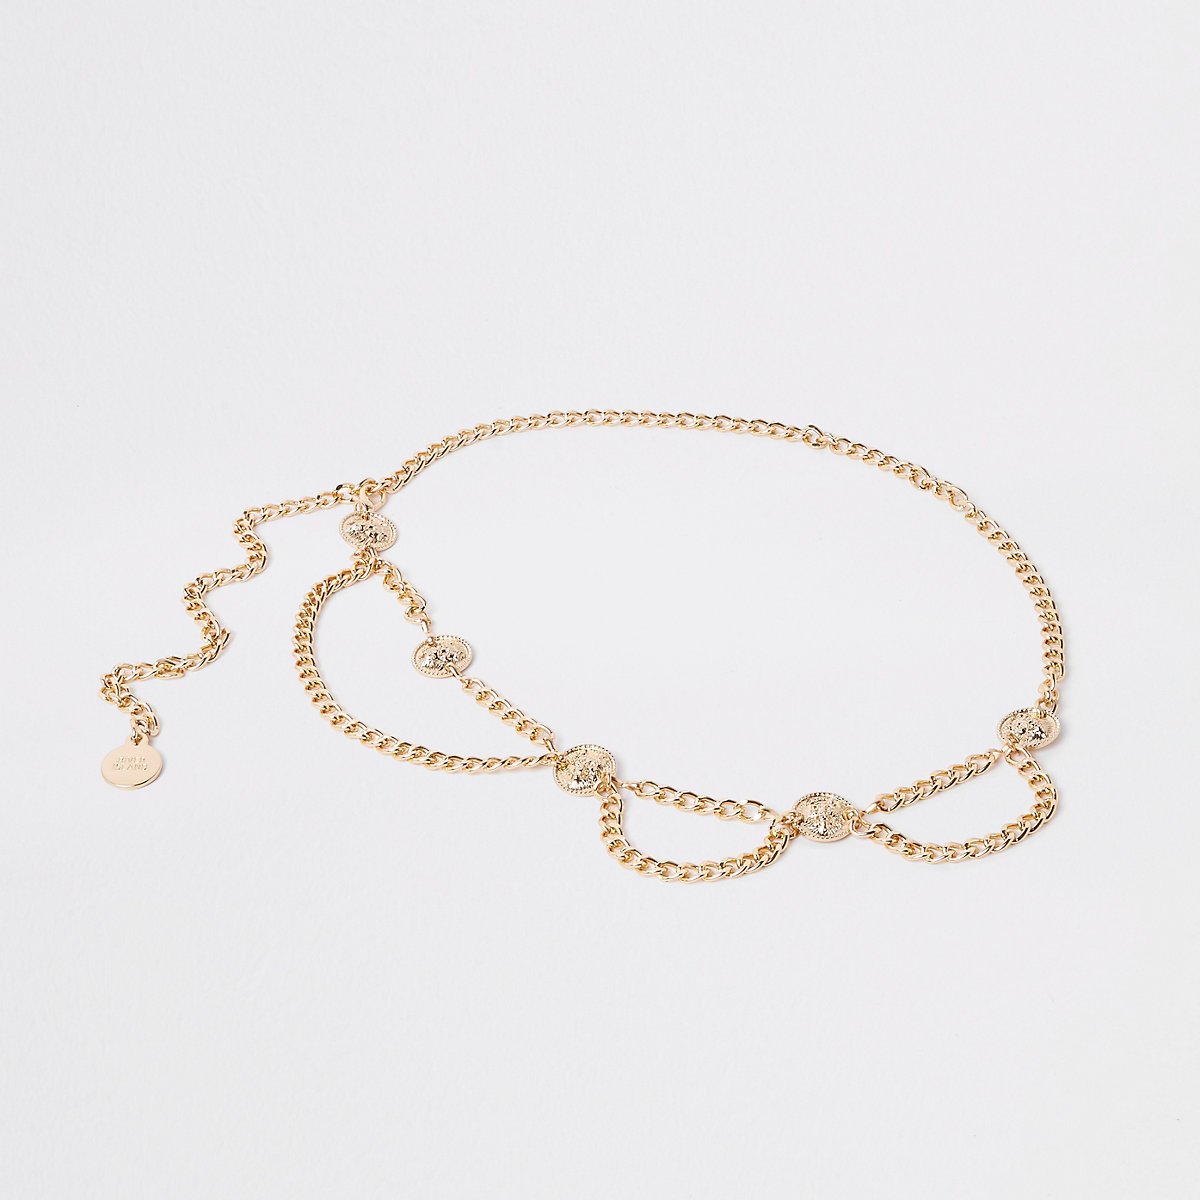 Gold tone coin chain waist belt